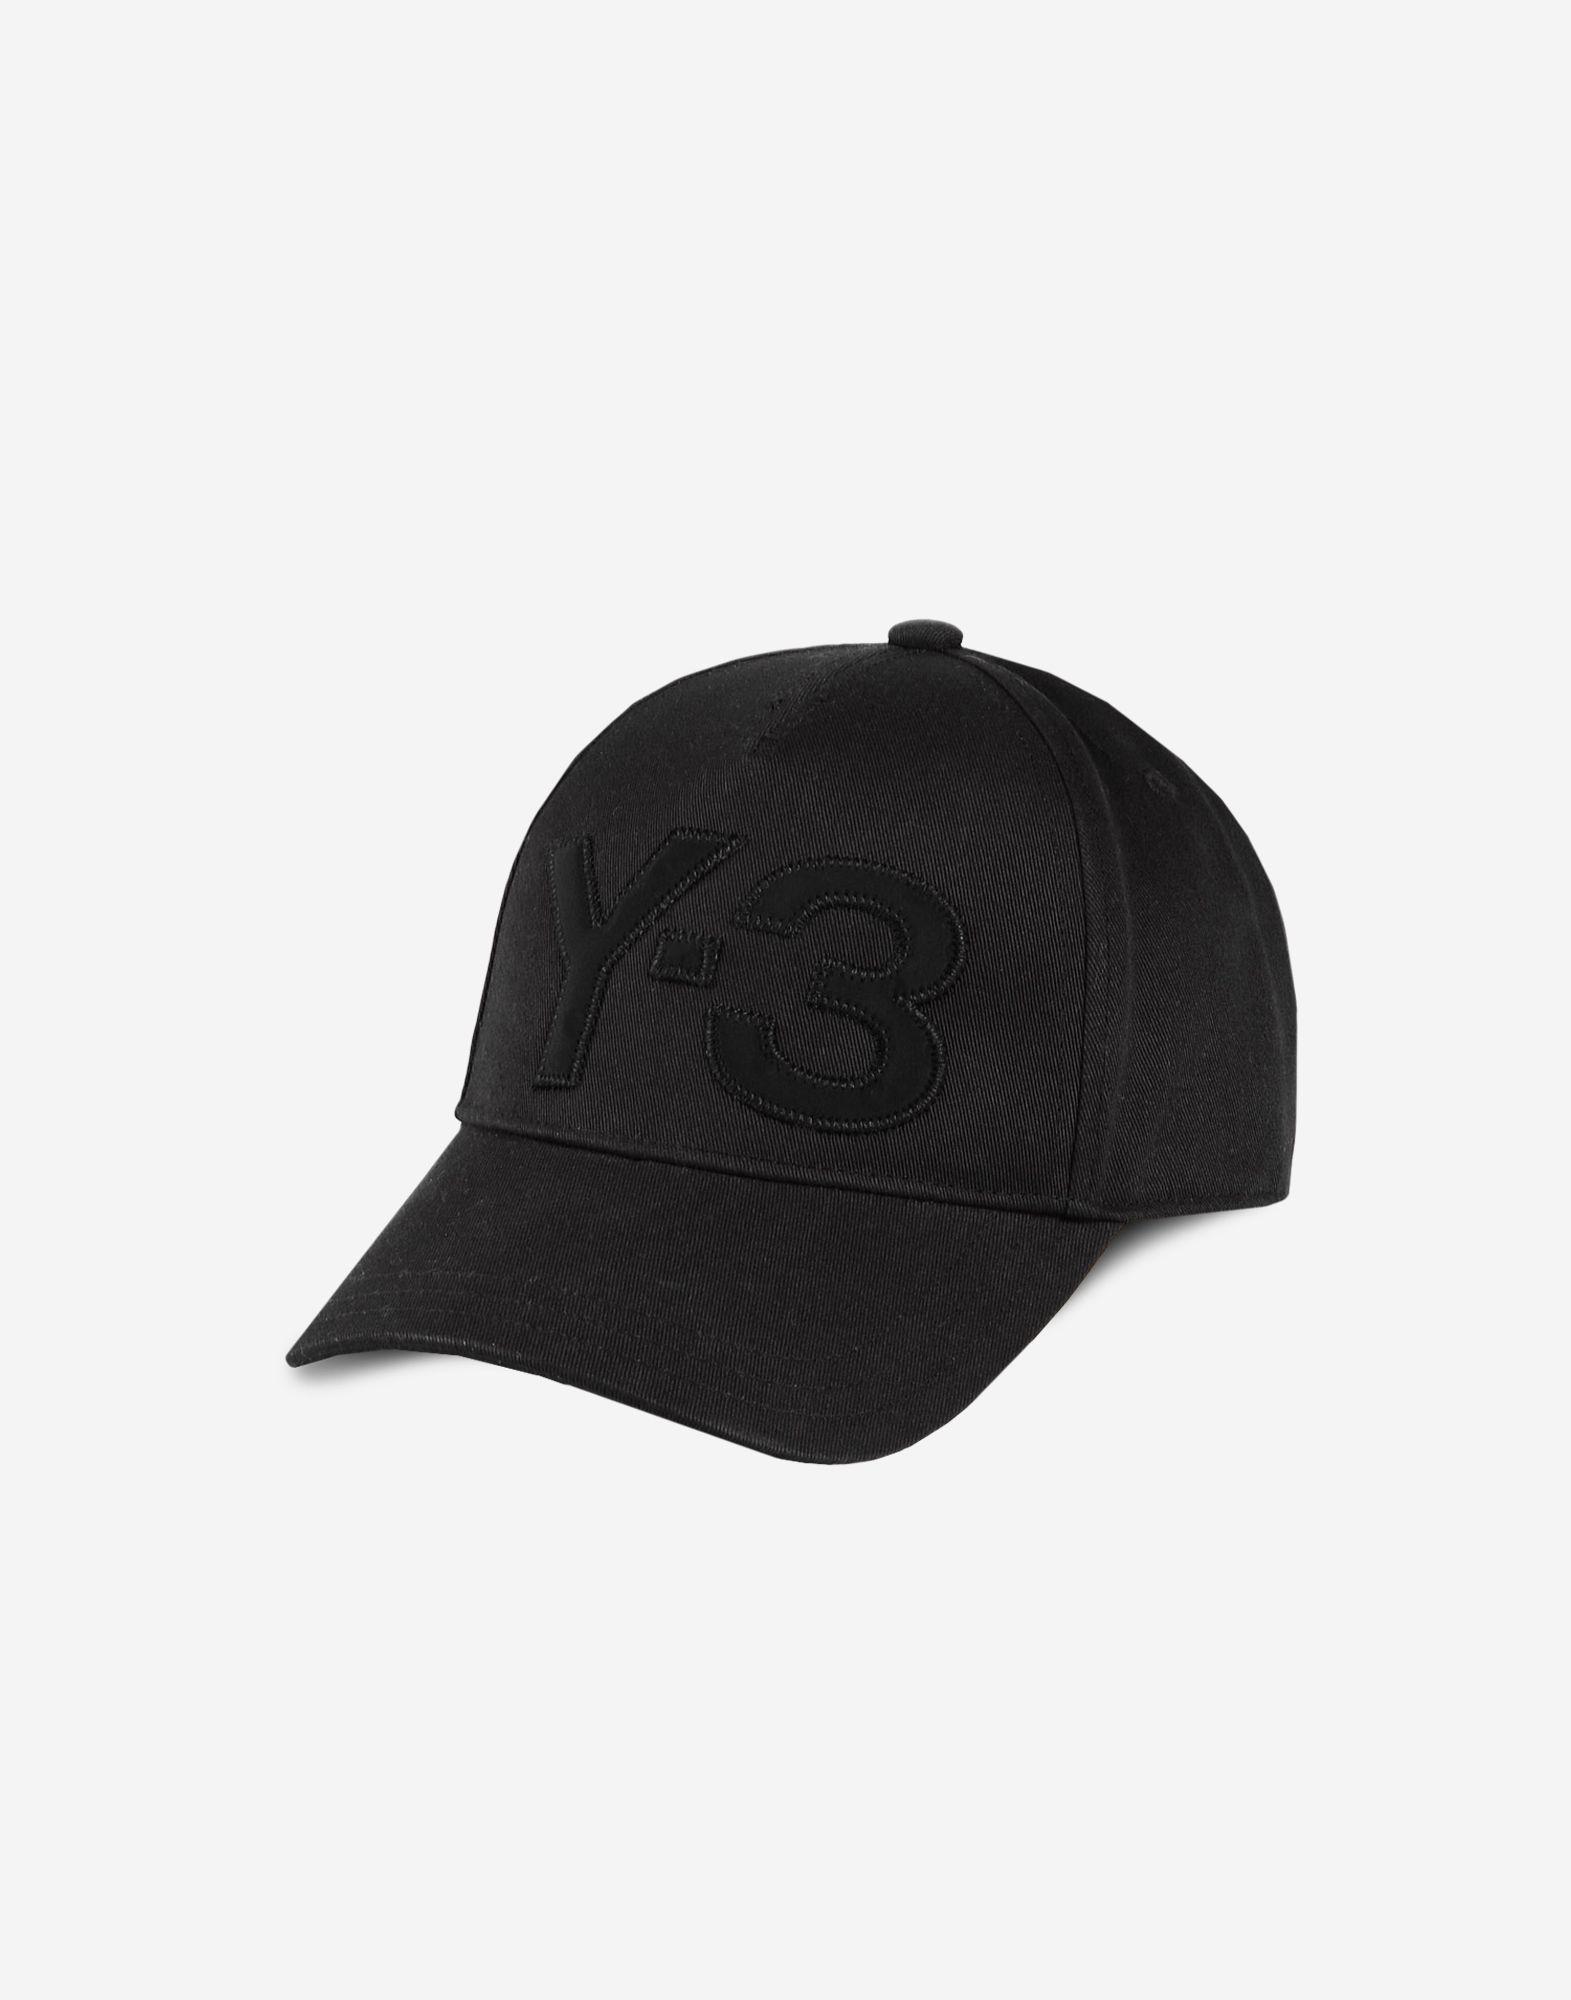 d460521b5b9 ... Y-3 Y-3 Baseball Neoprene Cap Cap E f ...